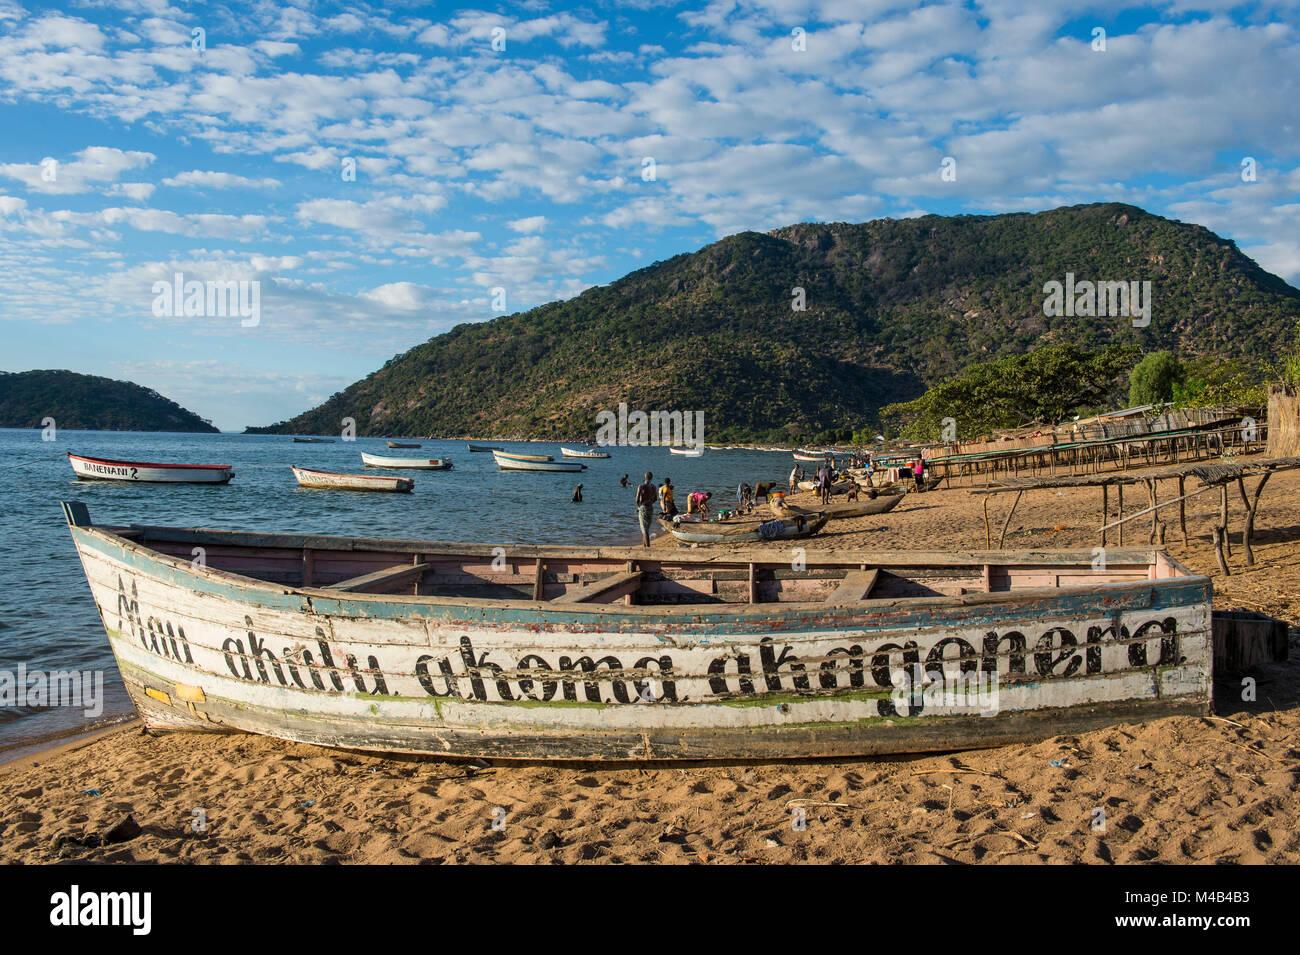 Fishing boats on a beach,Lake Malawi,Cape Maclear,Malawi,Africa Stock Photo